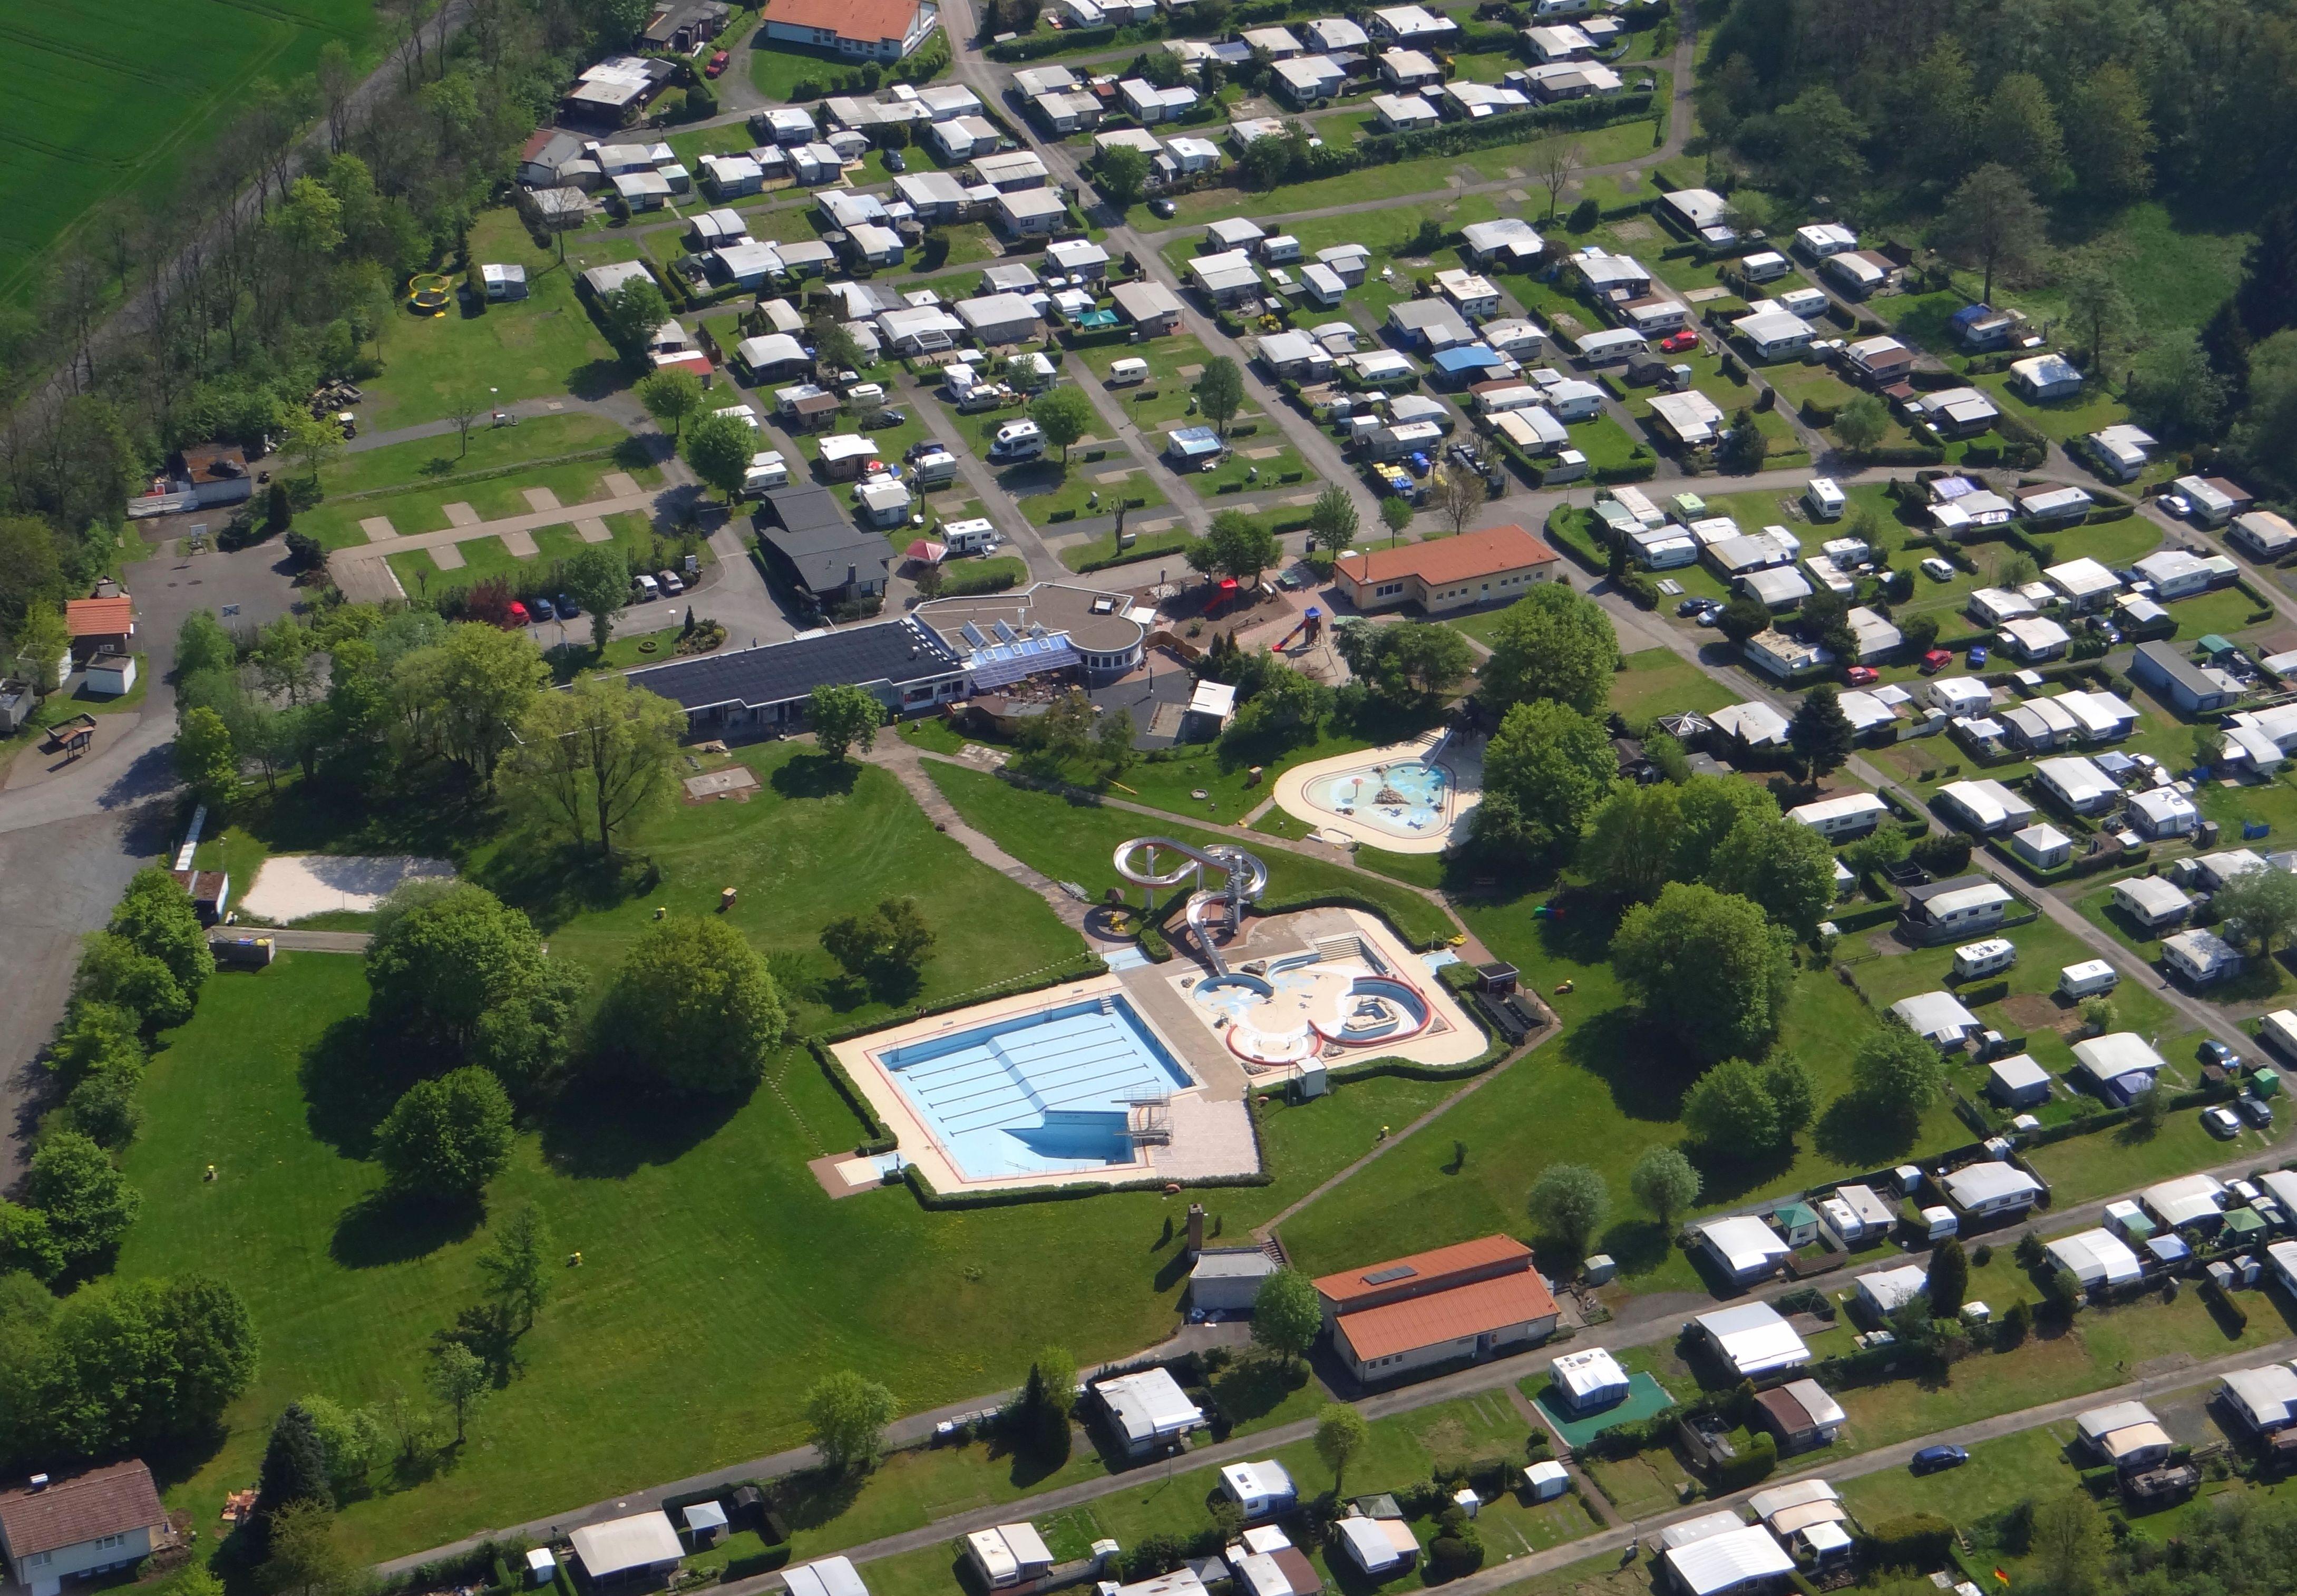 Luftaufnahme vom Campingplatz Dransfeld